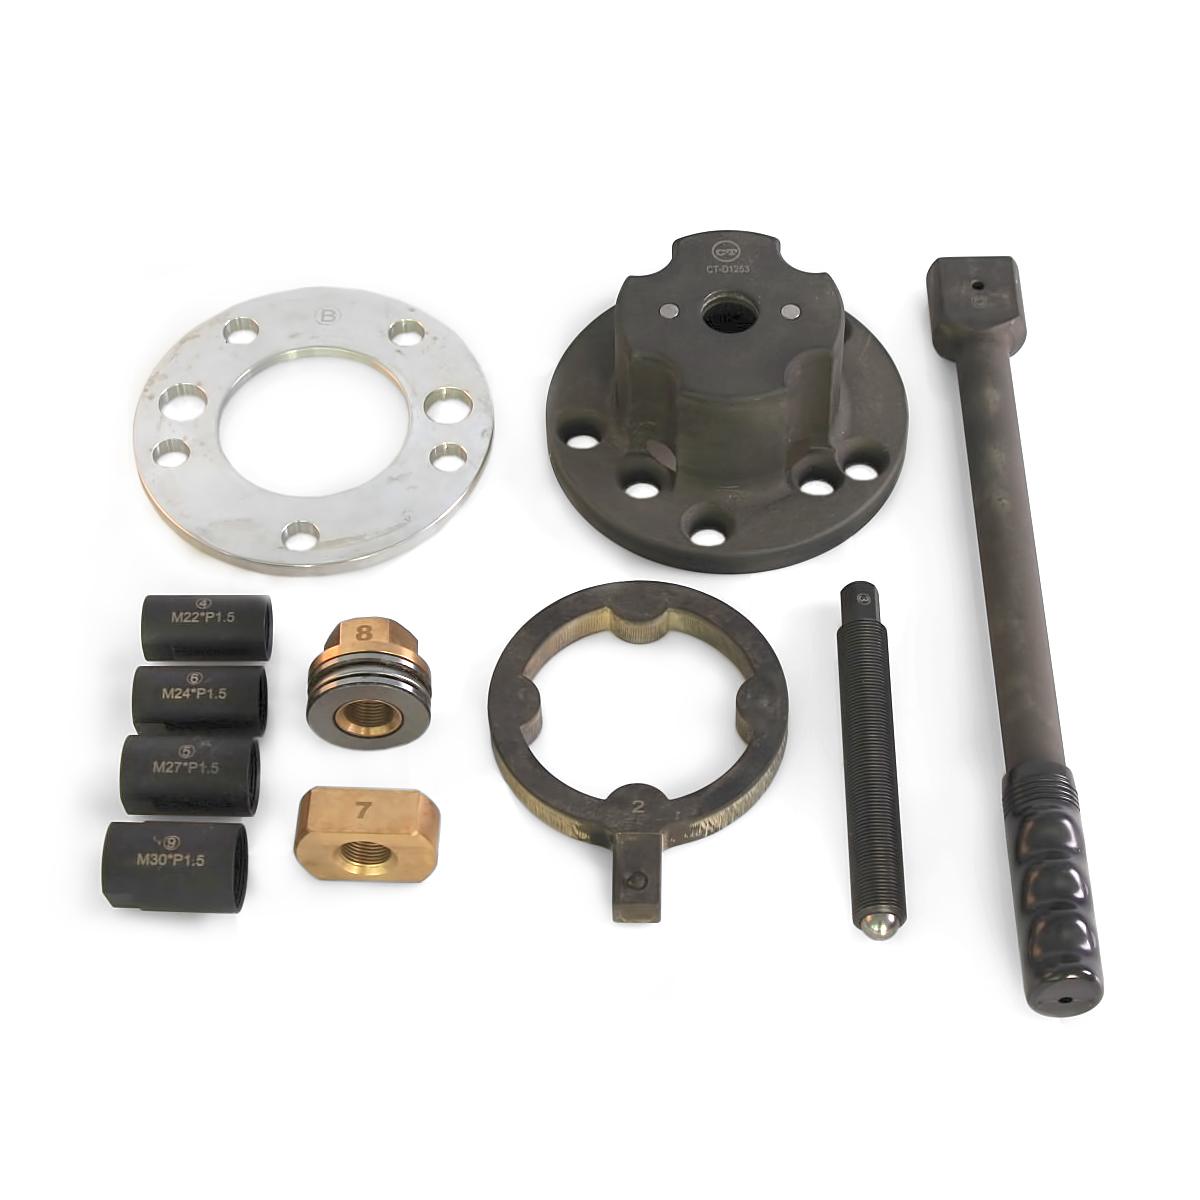 Съемник приводного вала BMW Car-Tool CT-D1253